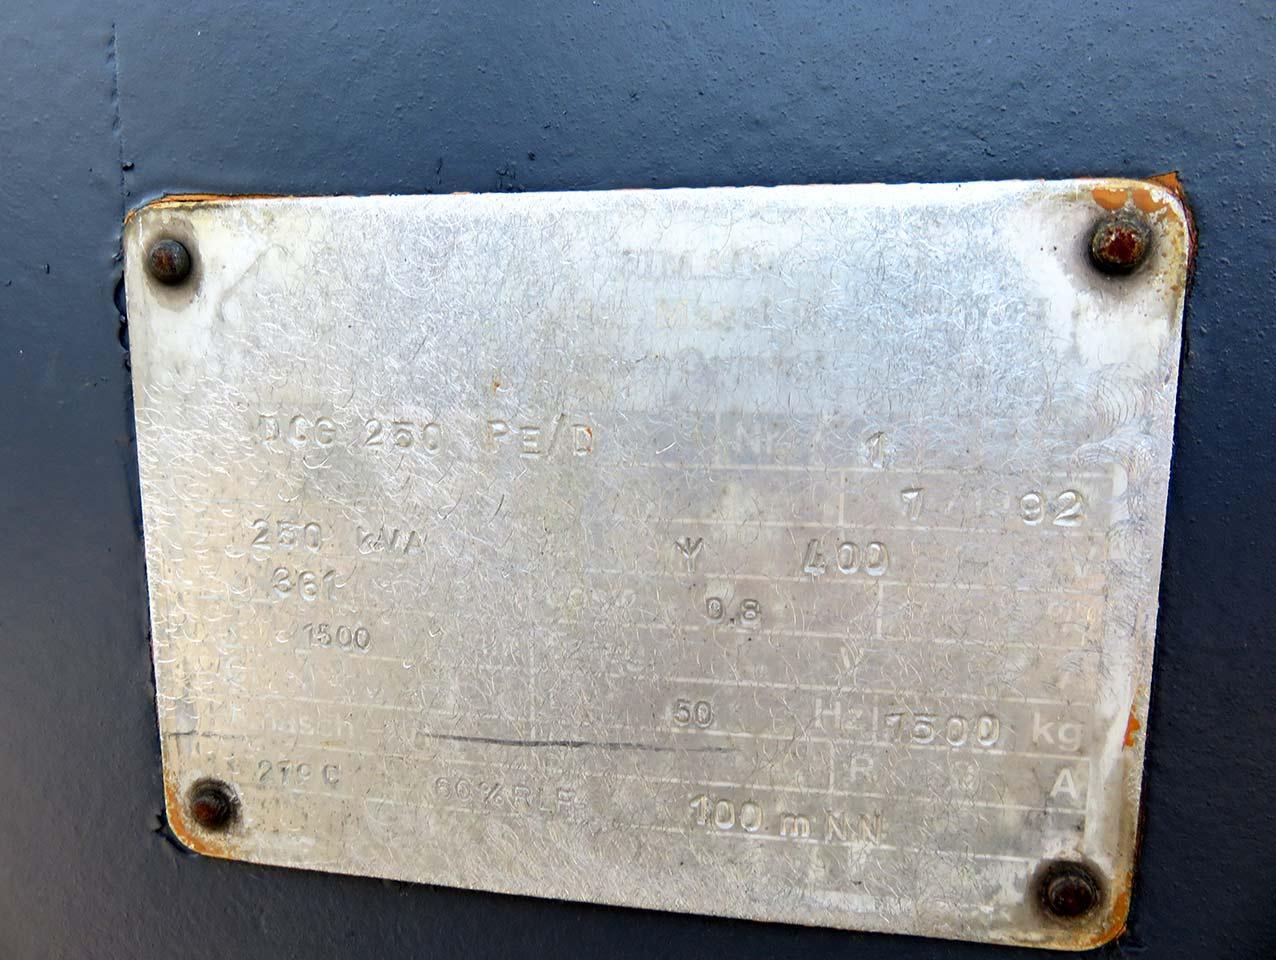 VEM generator shield